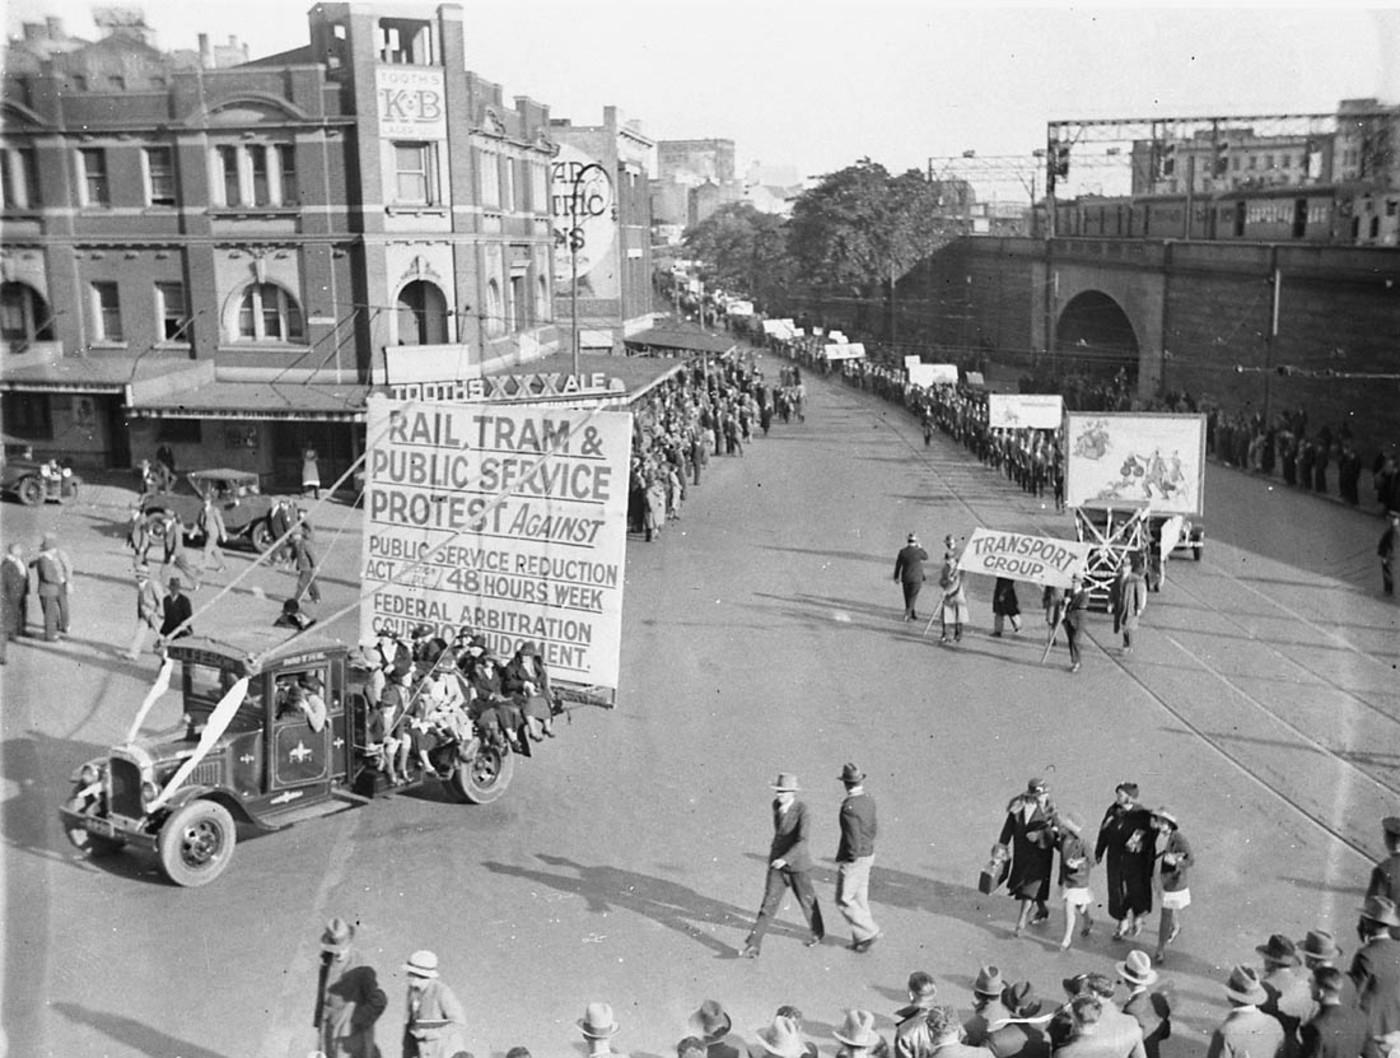 Street protest march (Ontario condo law blog post)